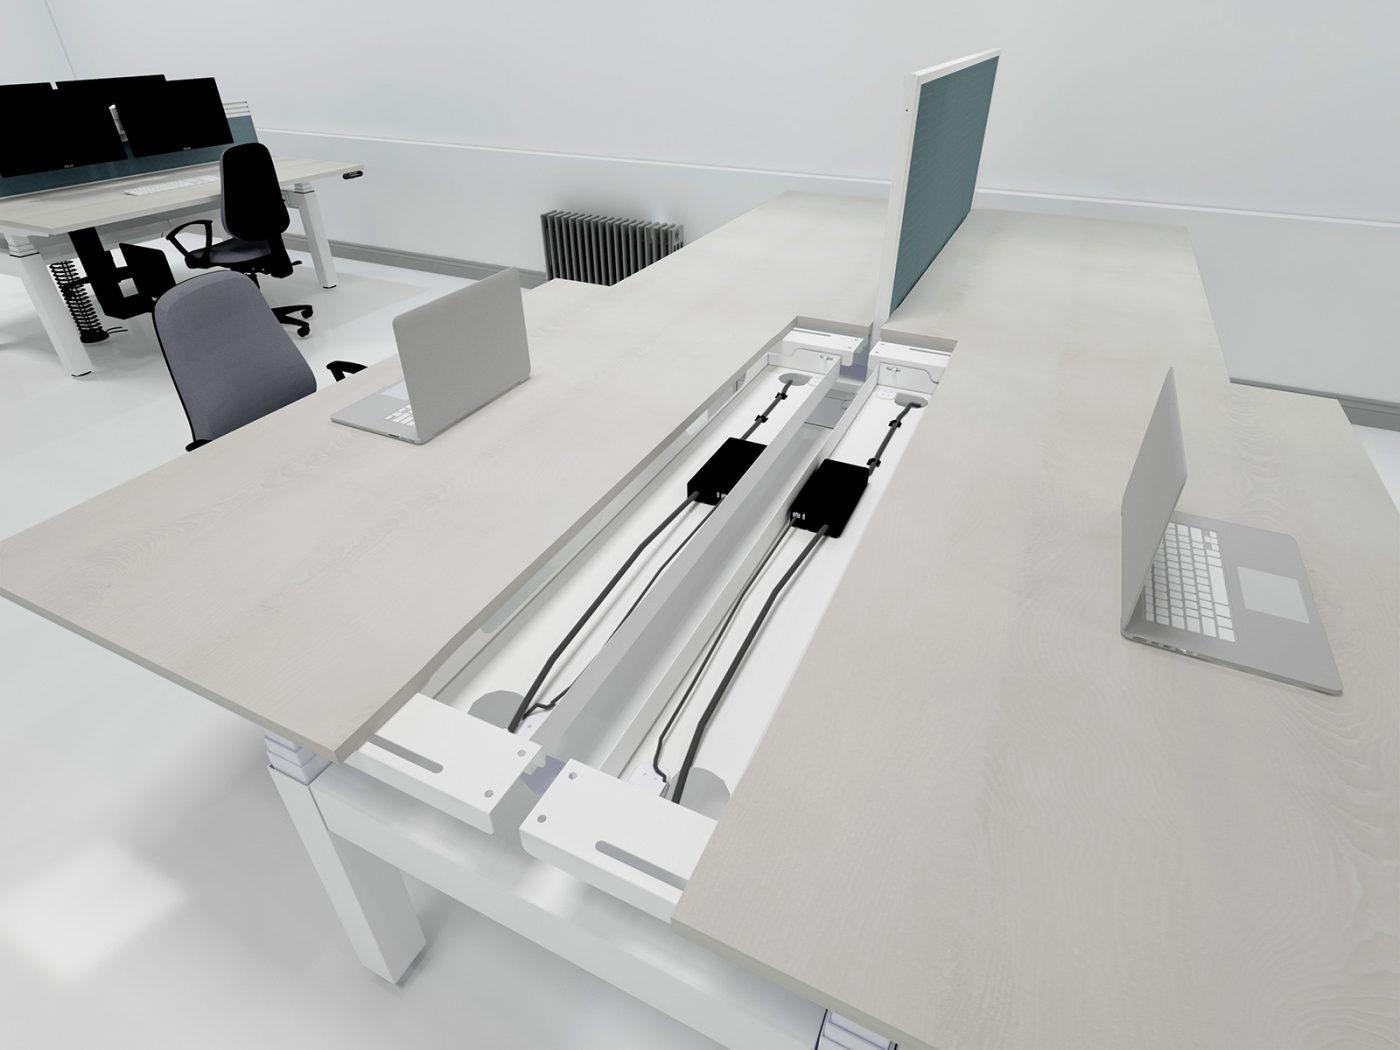 height adjustable, back-to-back desk, sliding tops, cable management, cable trays, dividing screen, desktop screen